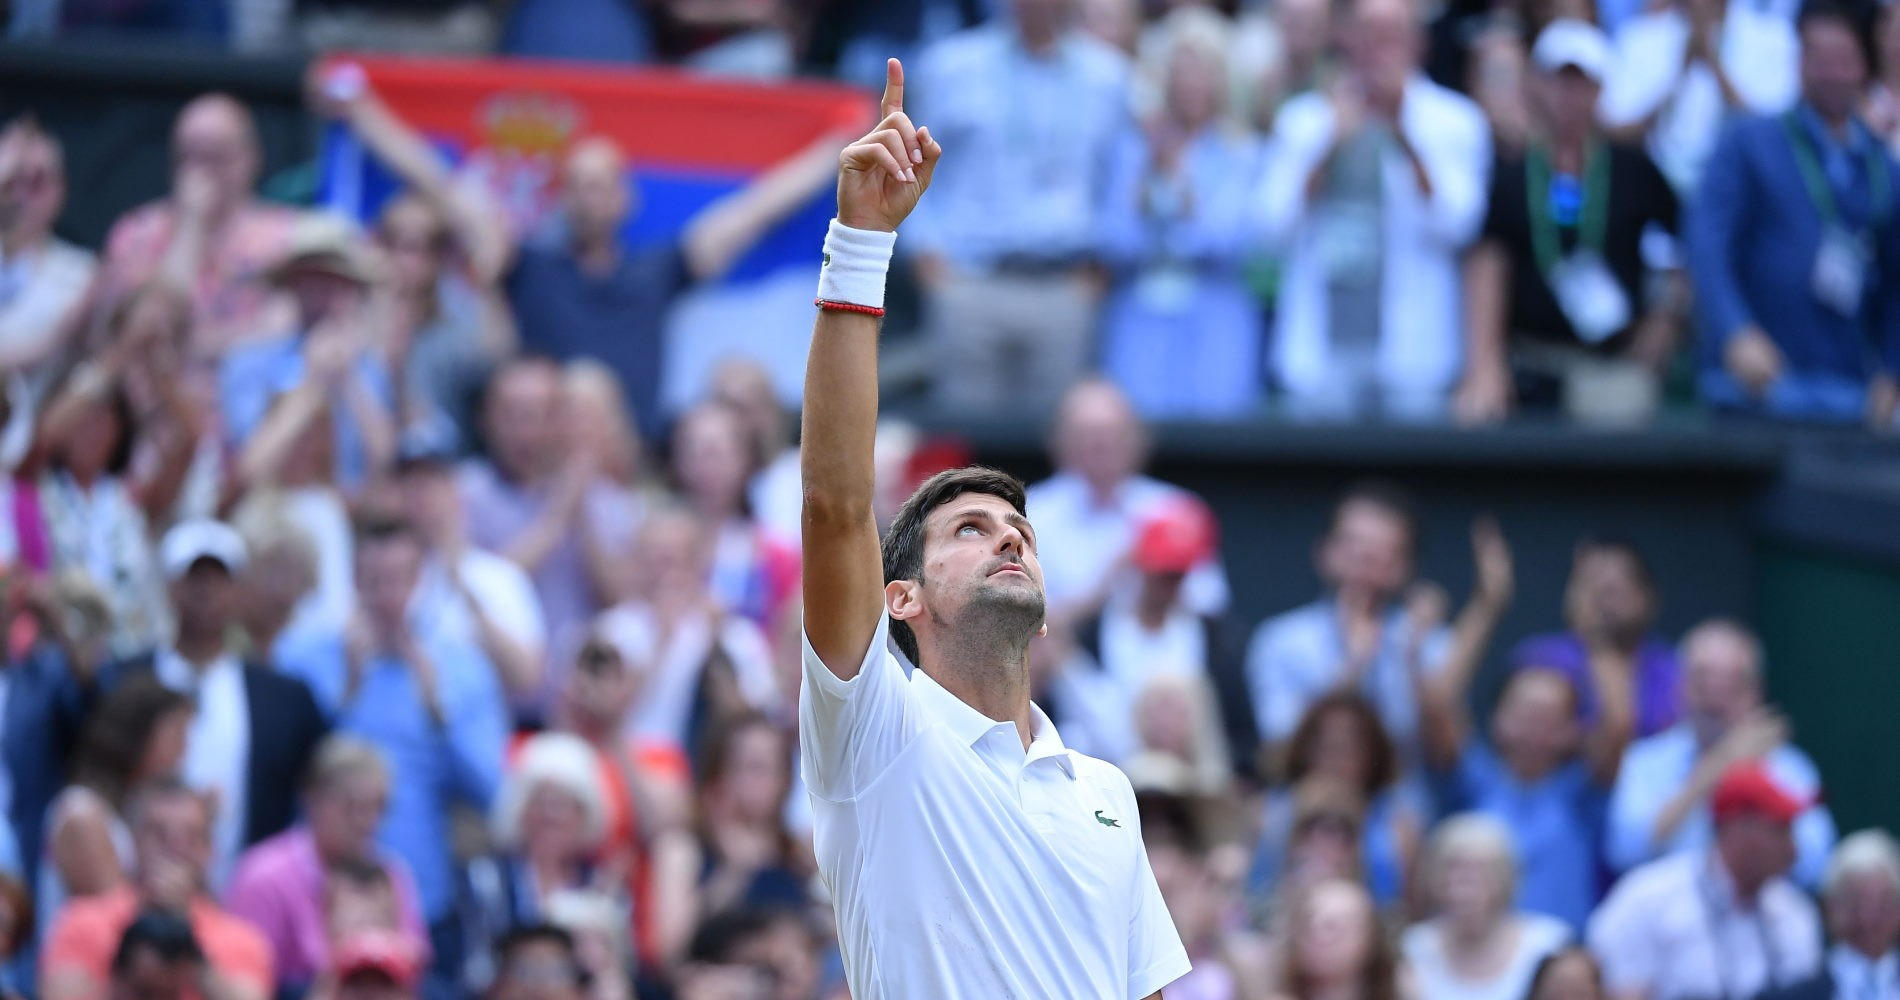 Novak_Djokovic_célébration_Wimbledon_2019